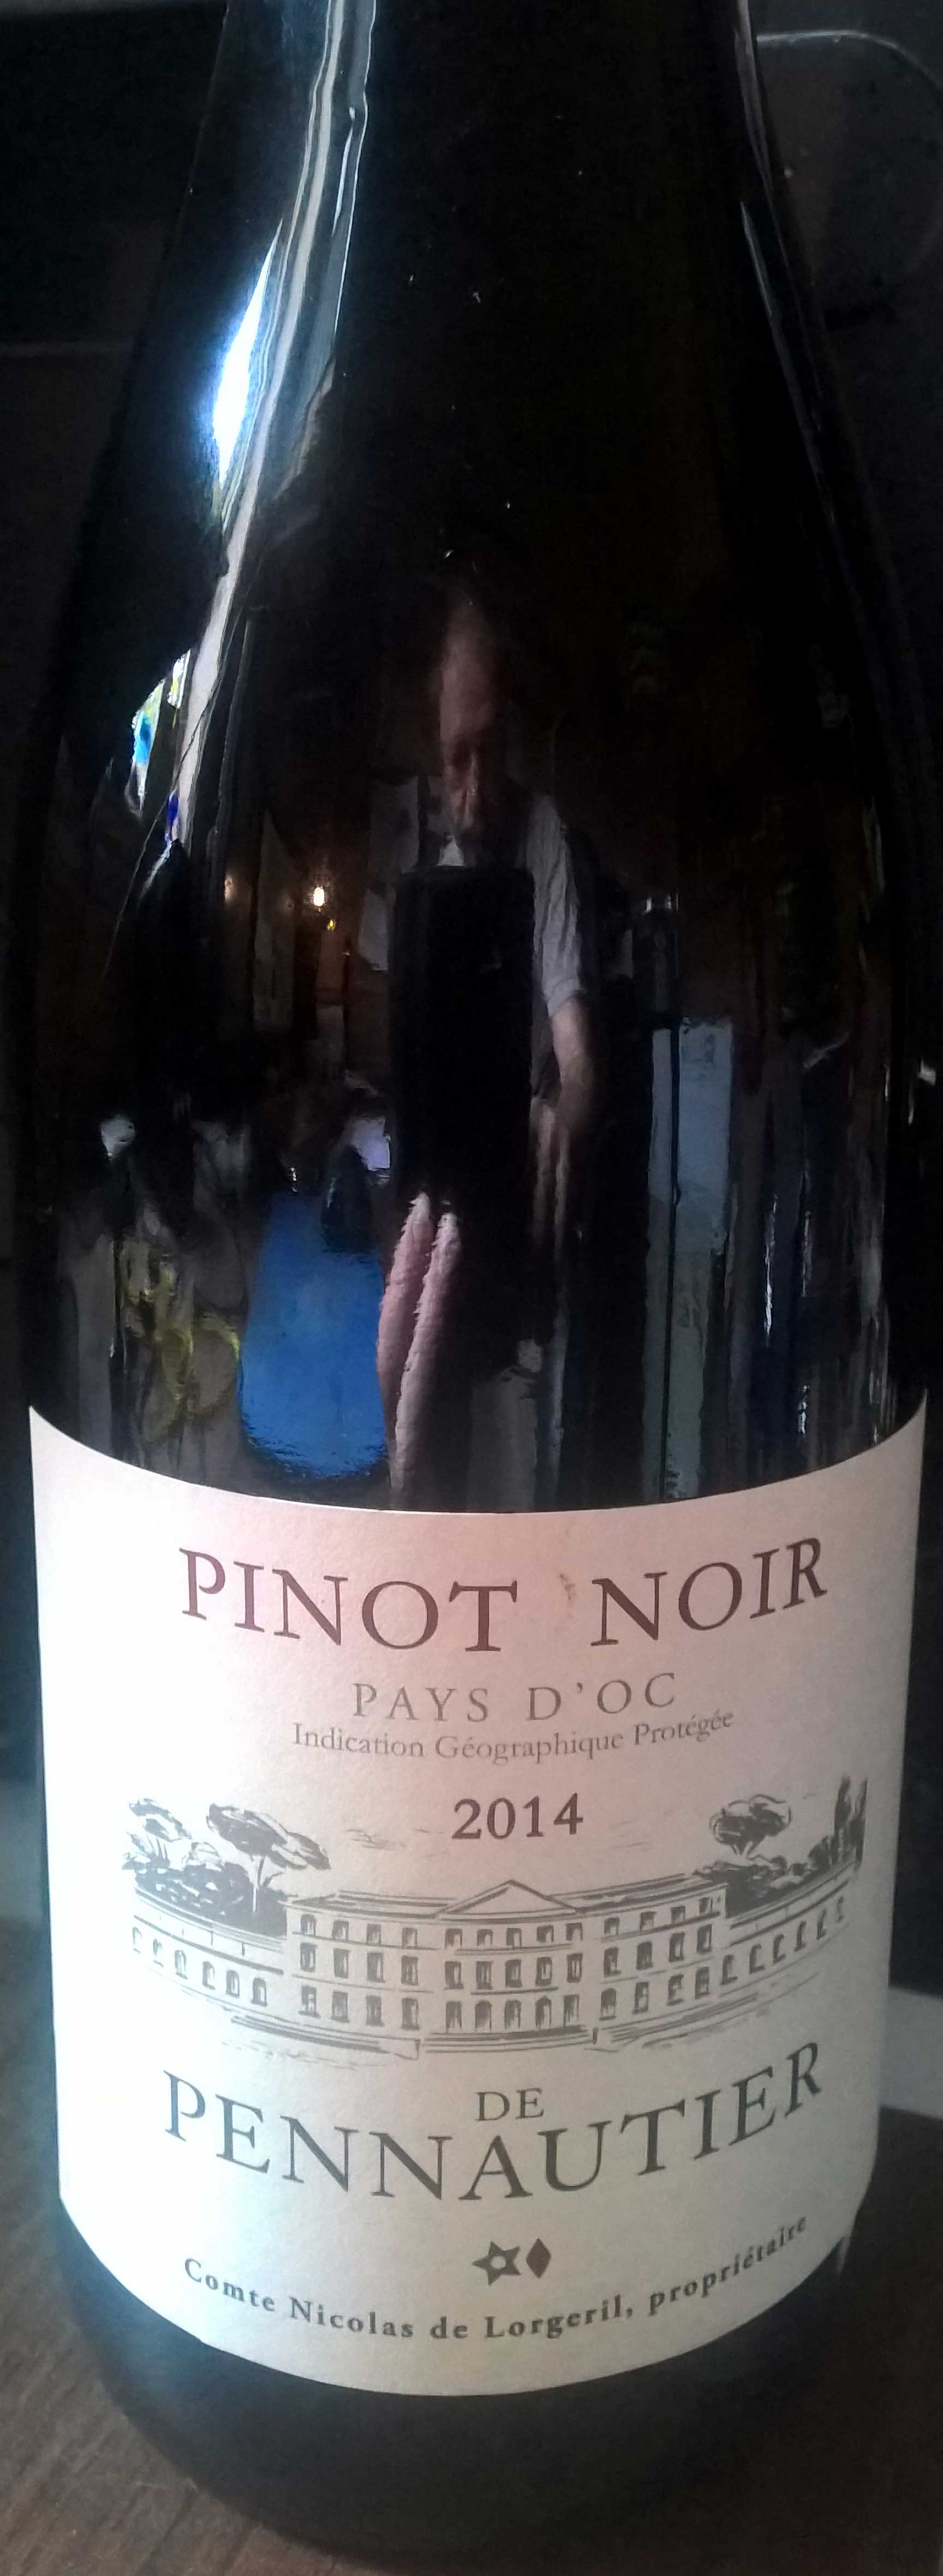 Pinot Noir de Pennautier ( Vign. Lorgeril ) 2013